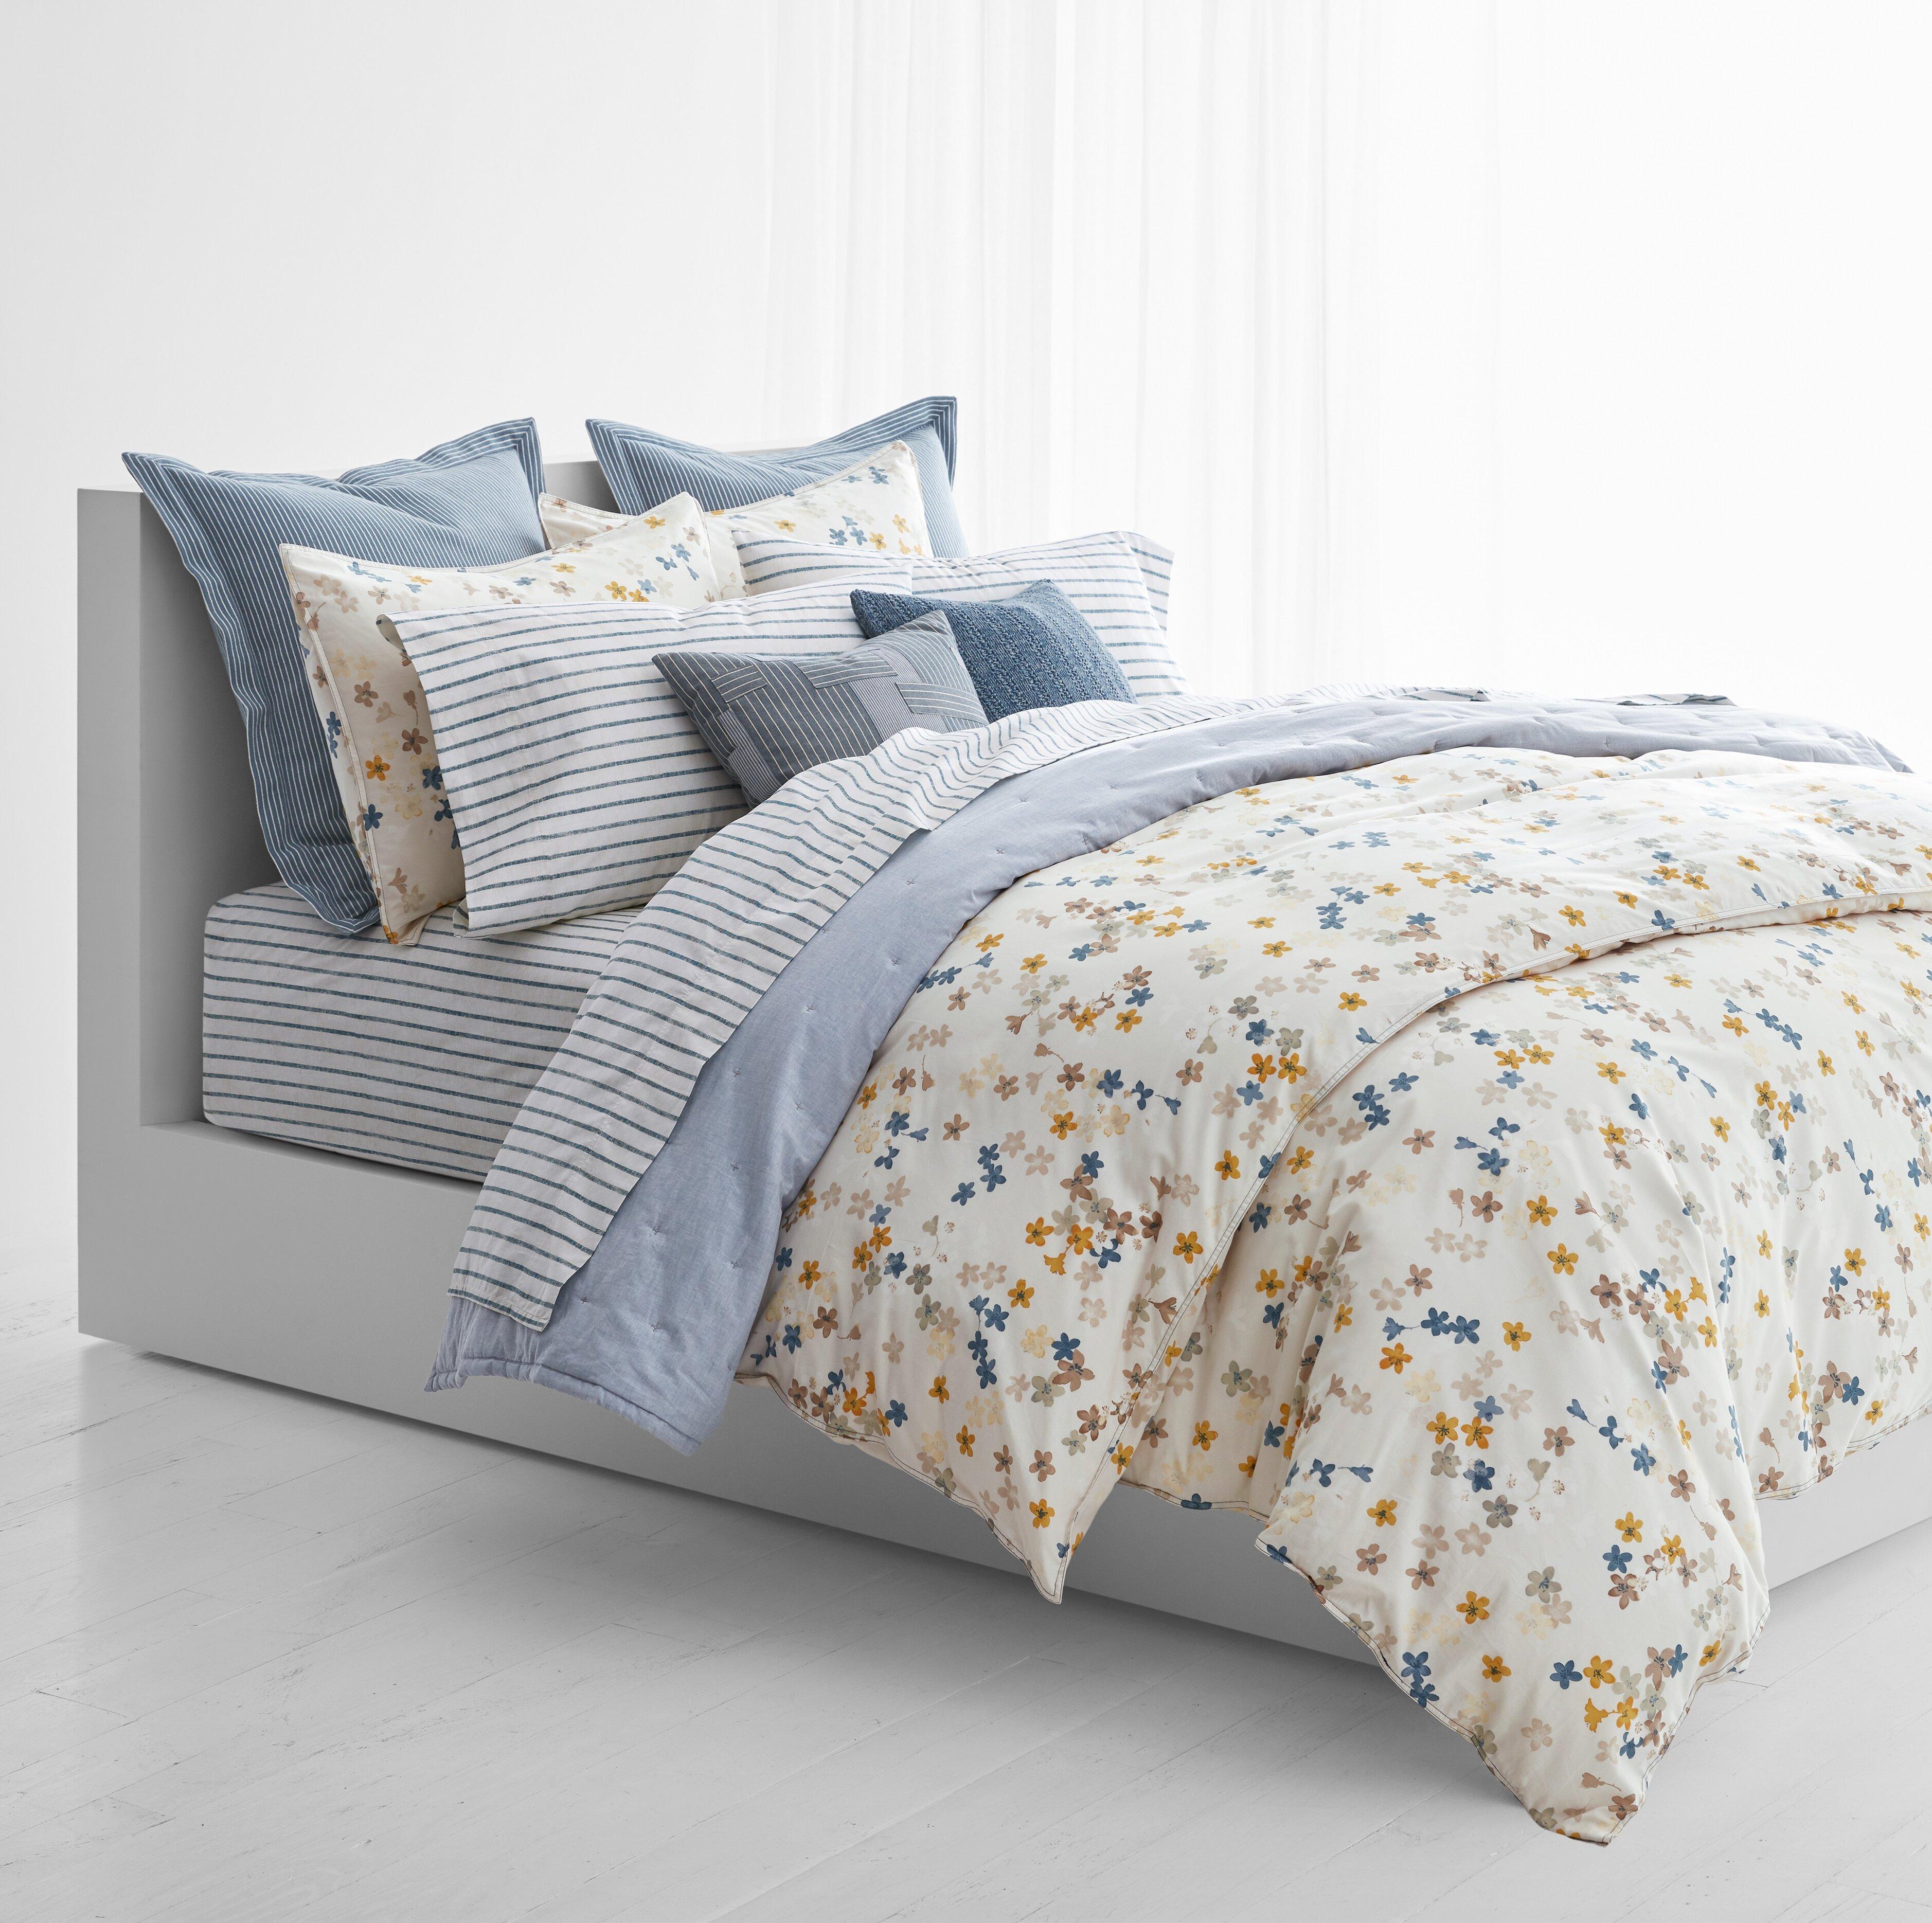 bath bed comforter reviews set lane cogswell birch pdp linen